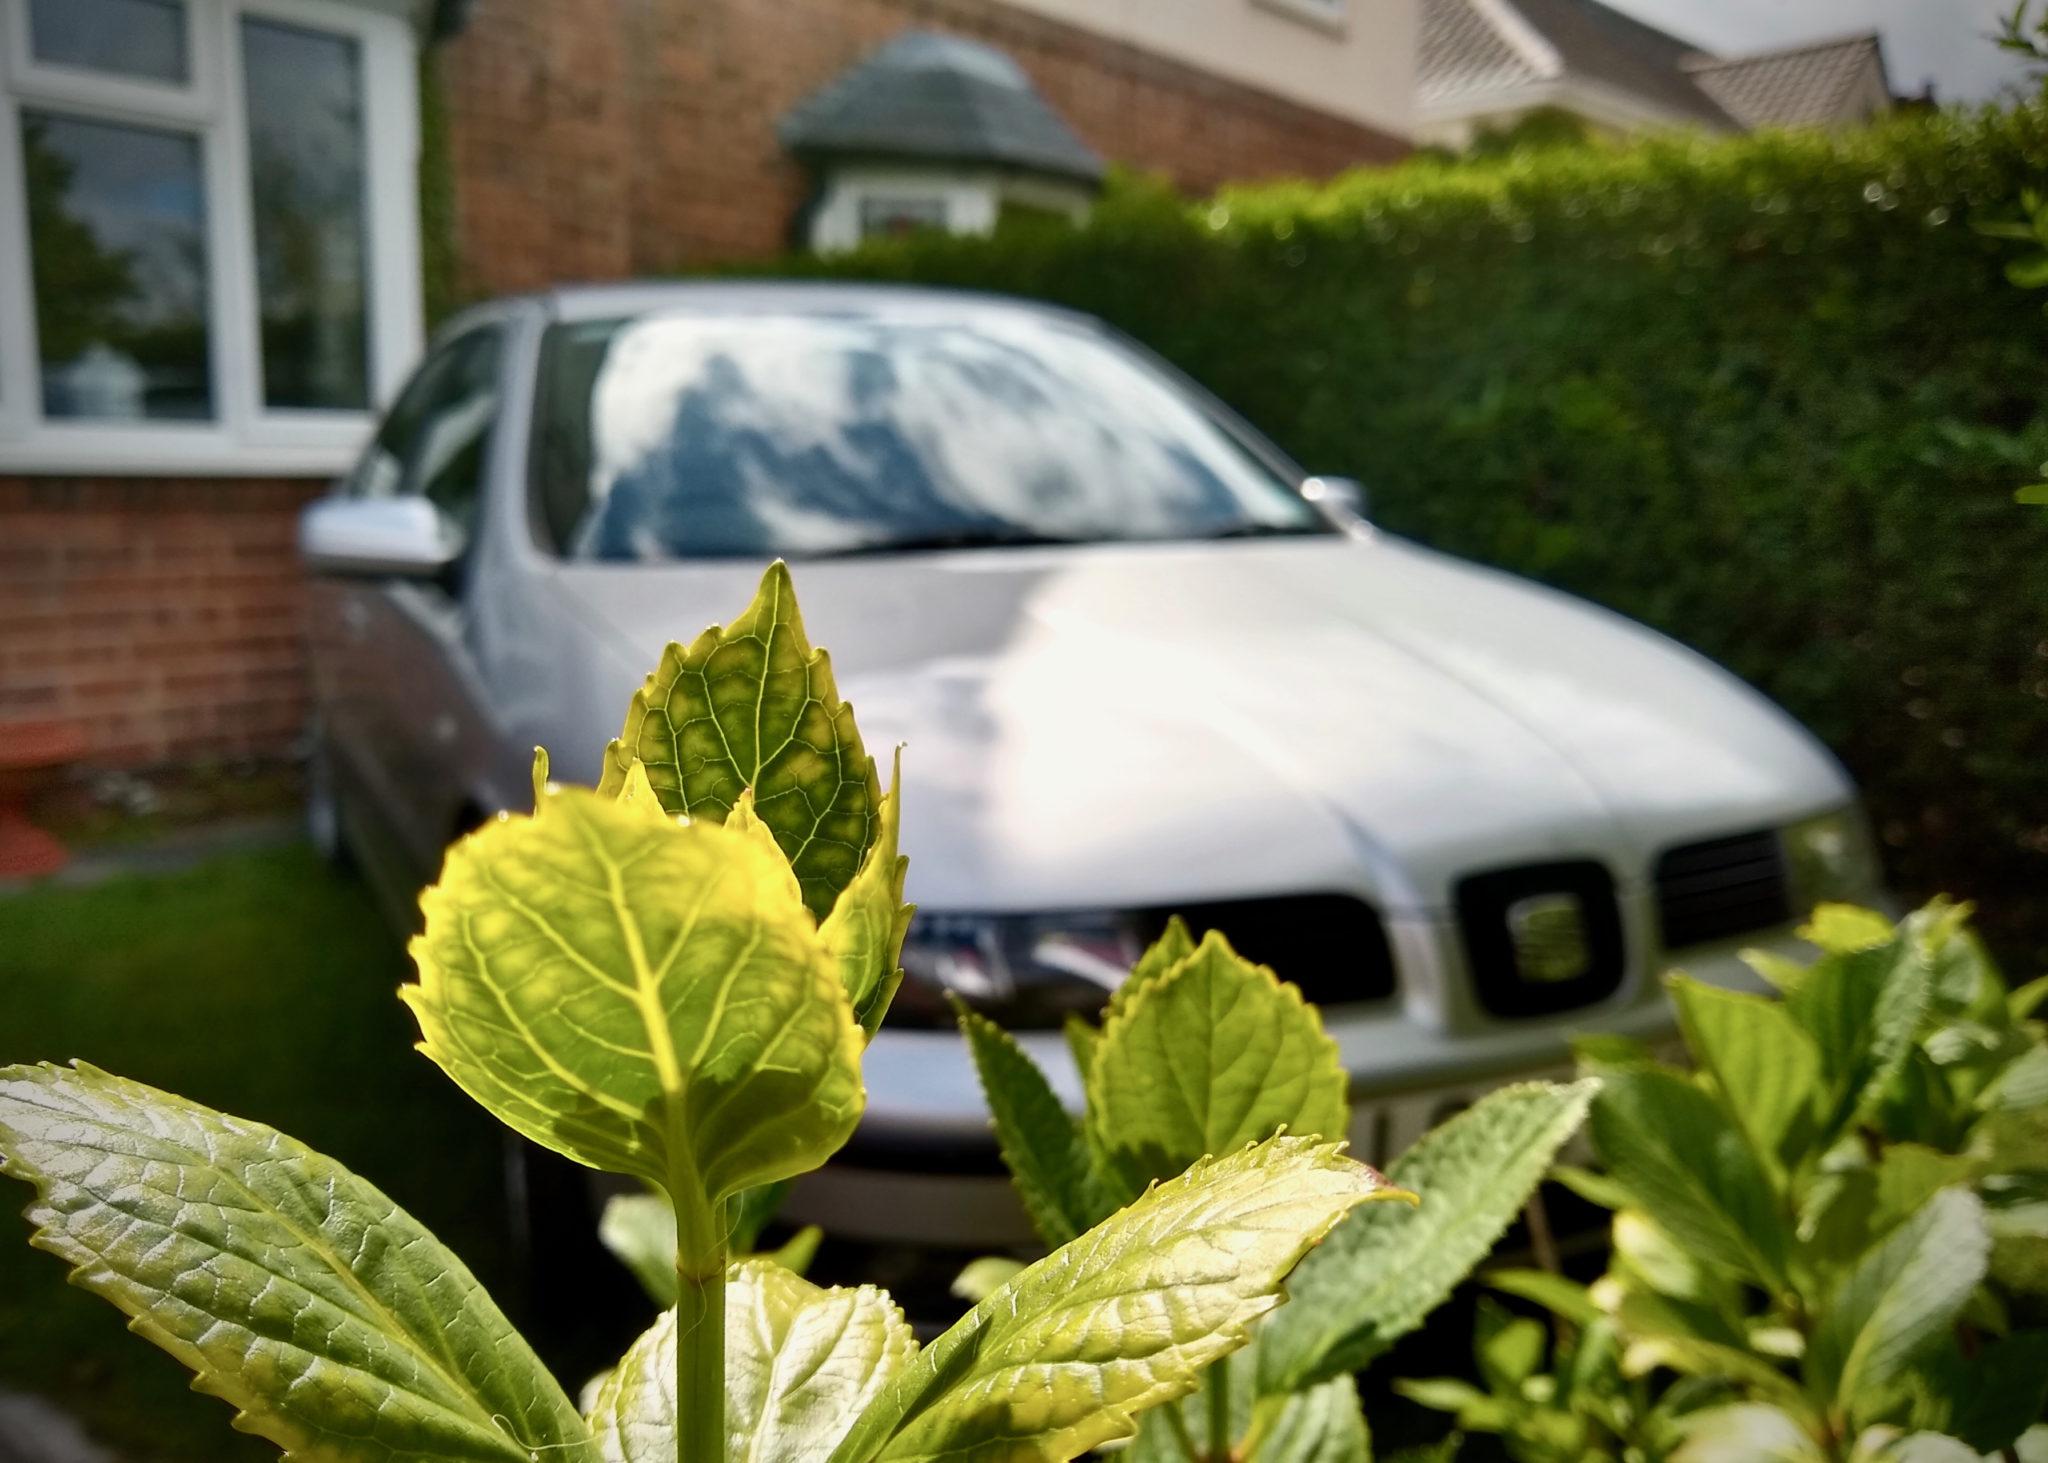 SEAT, Leon, SEAT Leon, Leon Cupra, Leon 20VT, Cupra, Not 2 Grand, N2G, N2Grand, not2grand.co.uk, car, car photo, cars